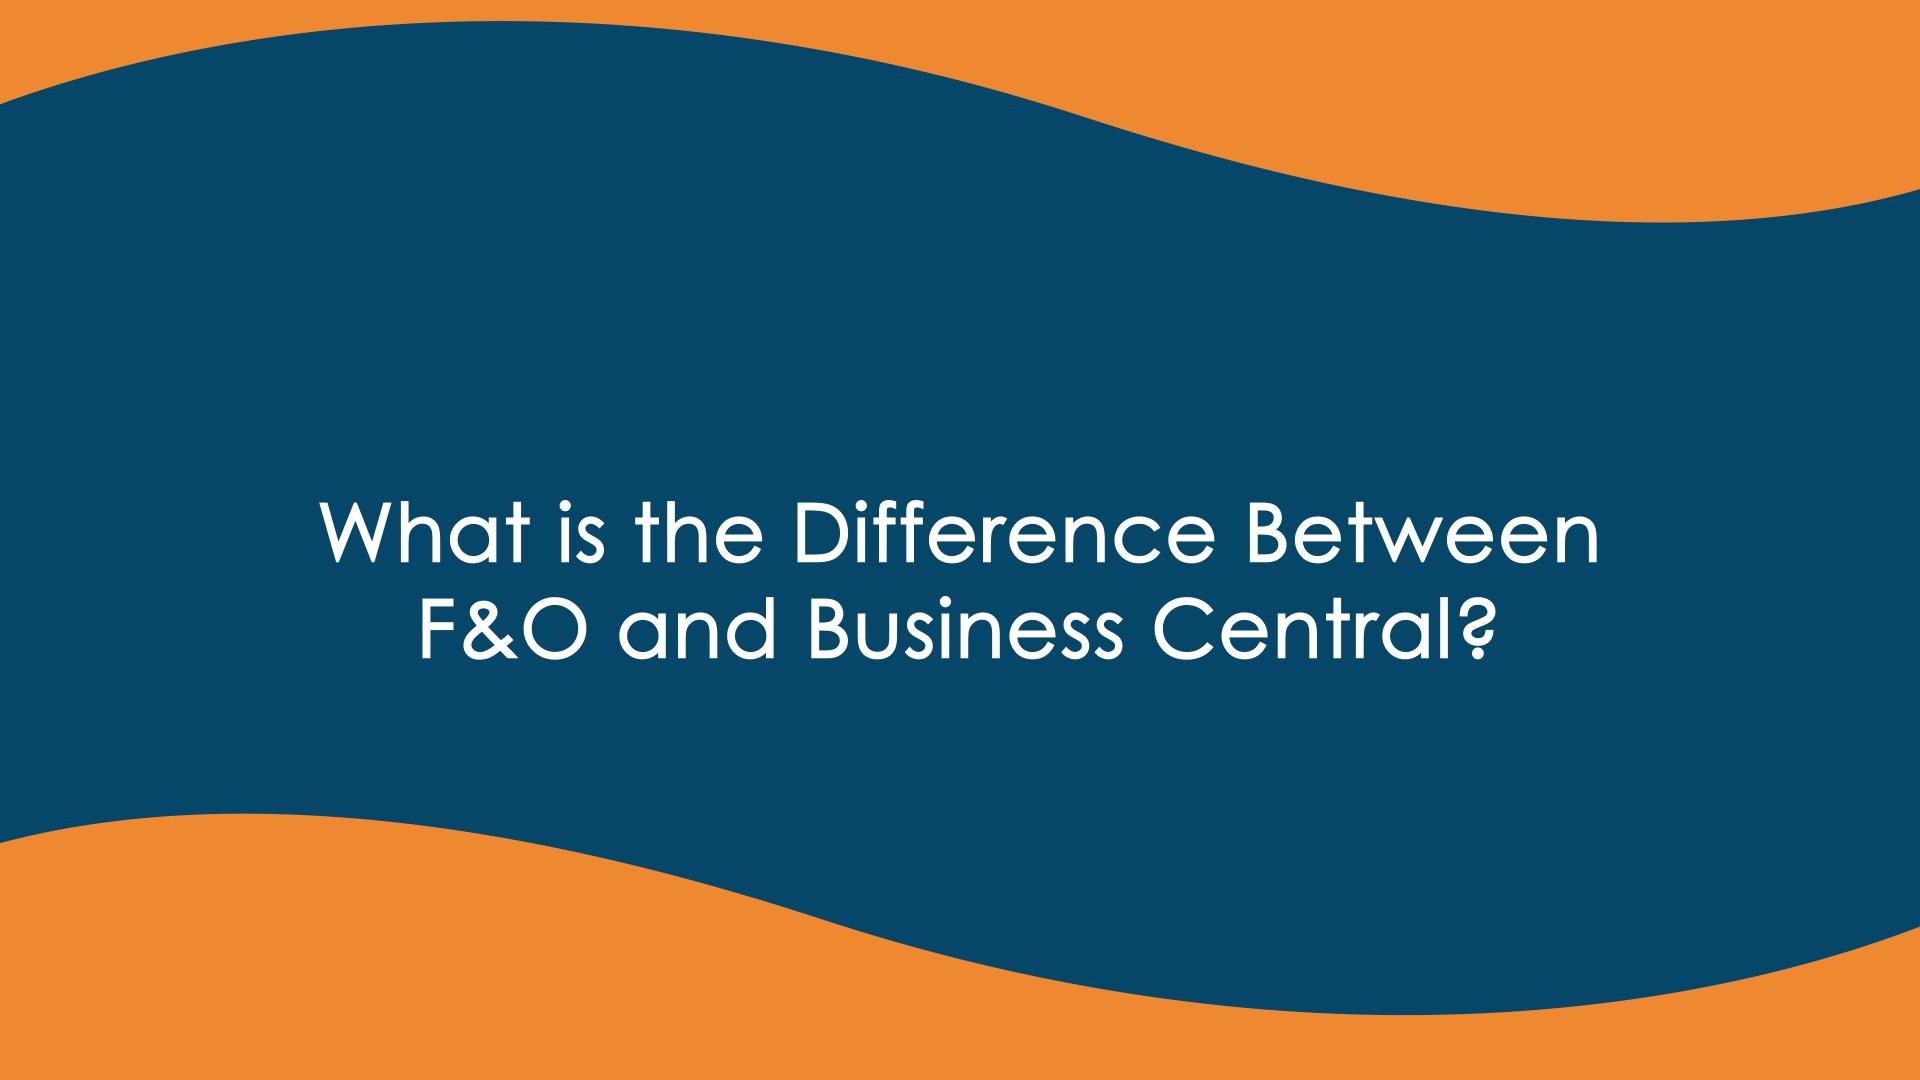 Business Central vs F&O - Final